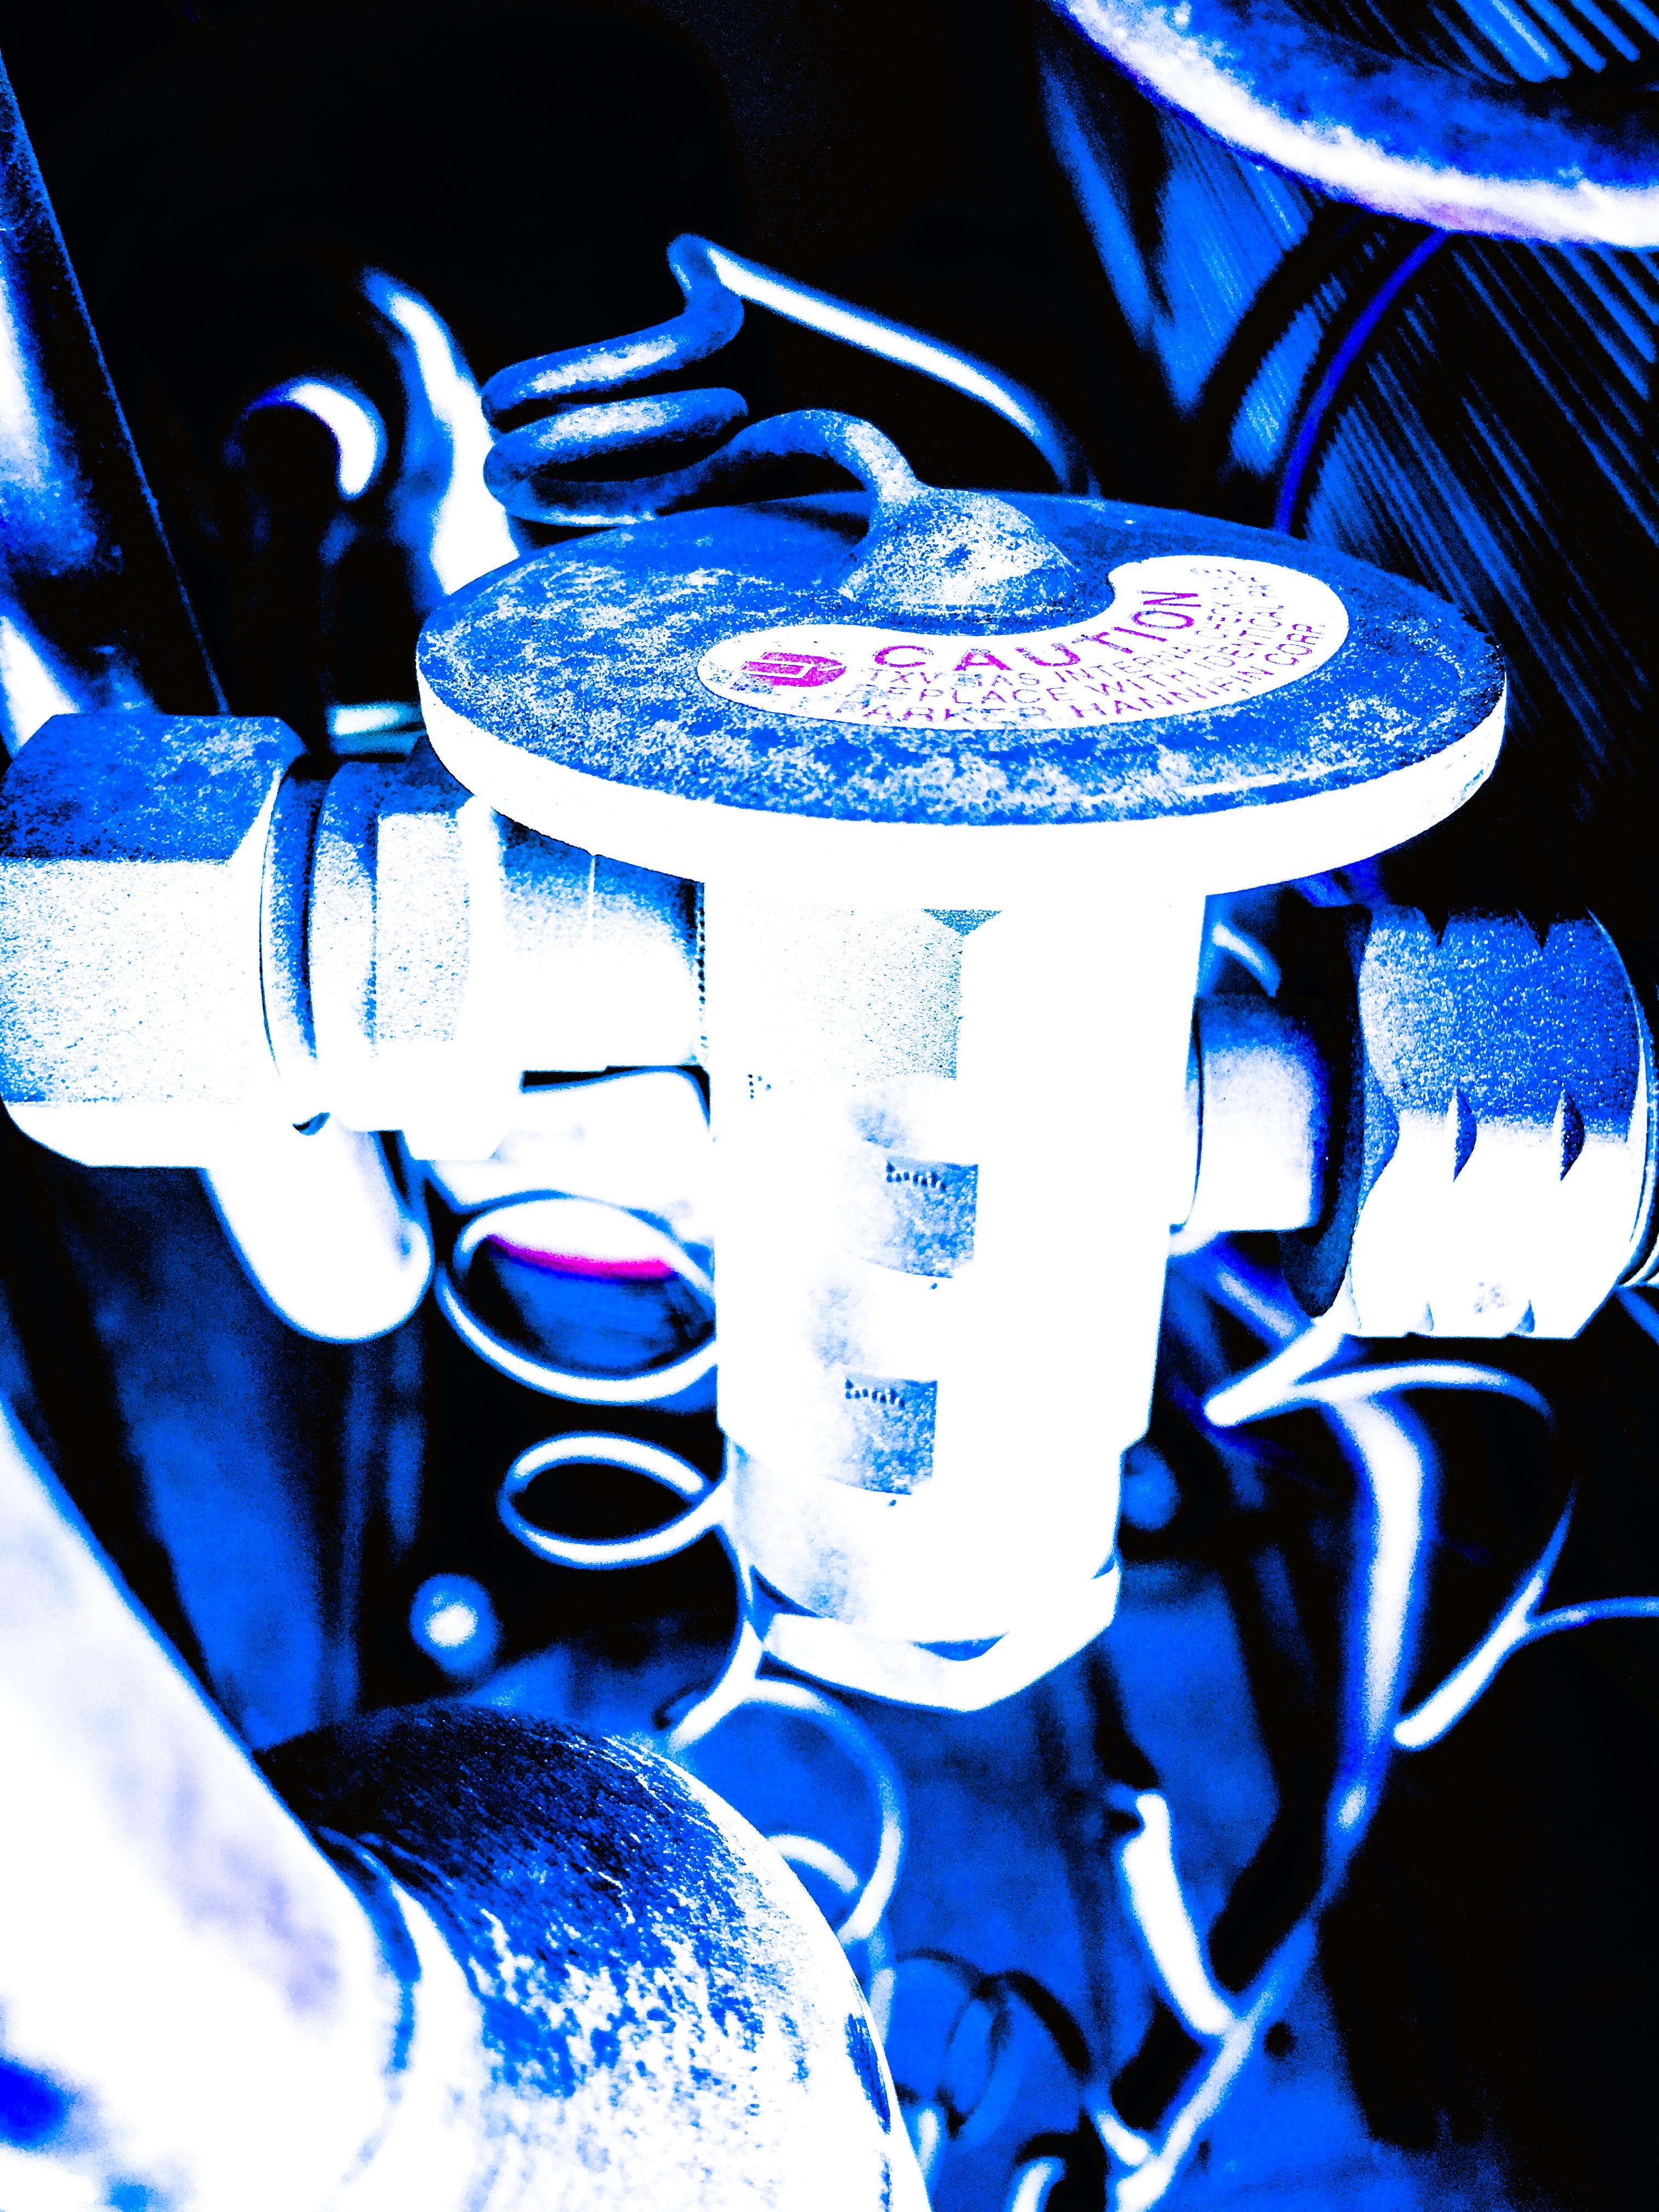 Random Heating and Cooling pics-img_0340.jpg